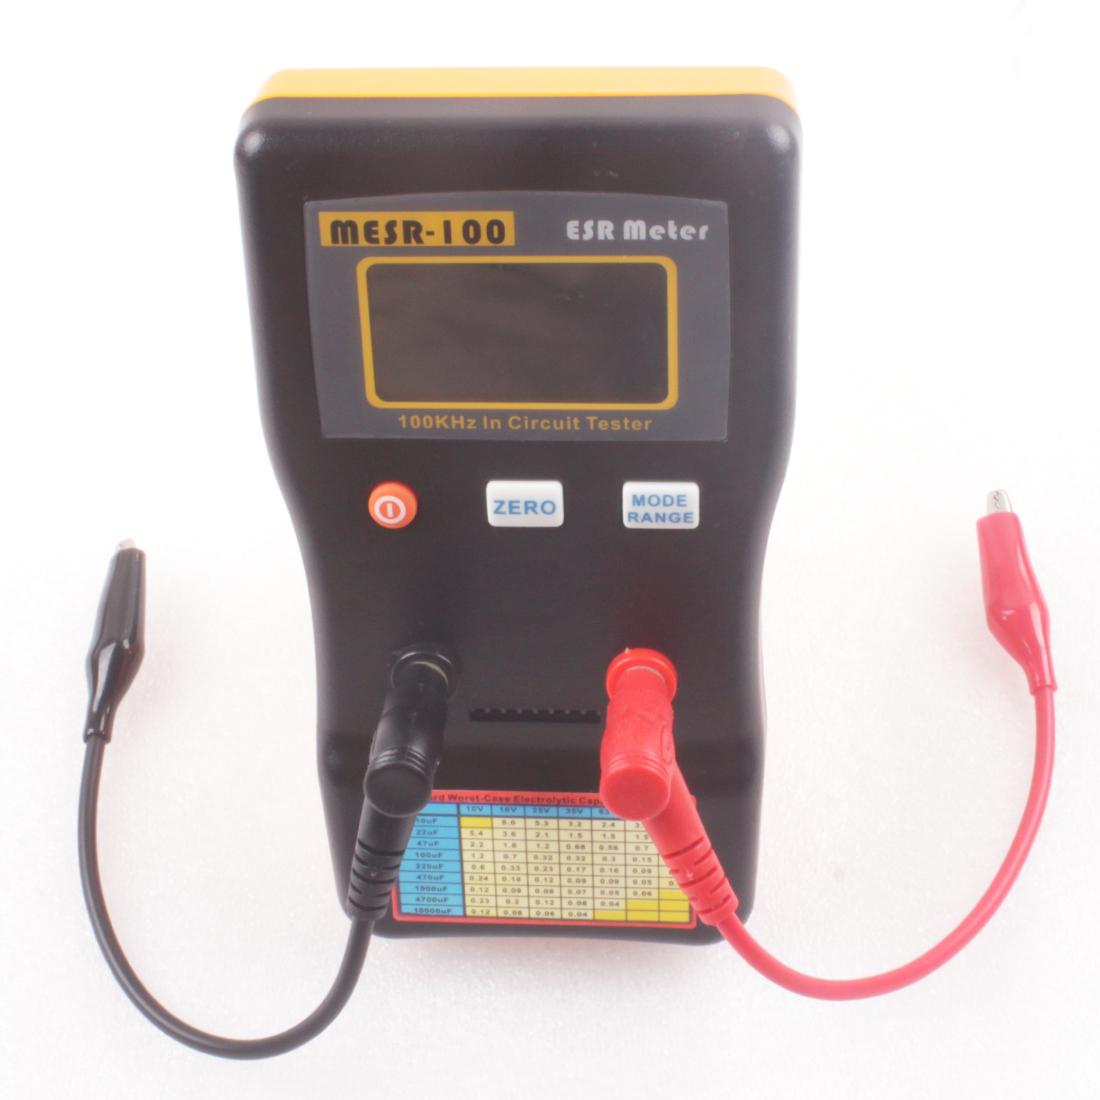 Brand New Mesr100 Autoranging Esr Tester In Circuit Capacitor Meter